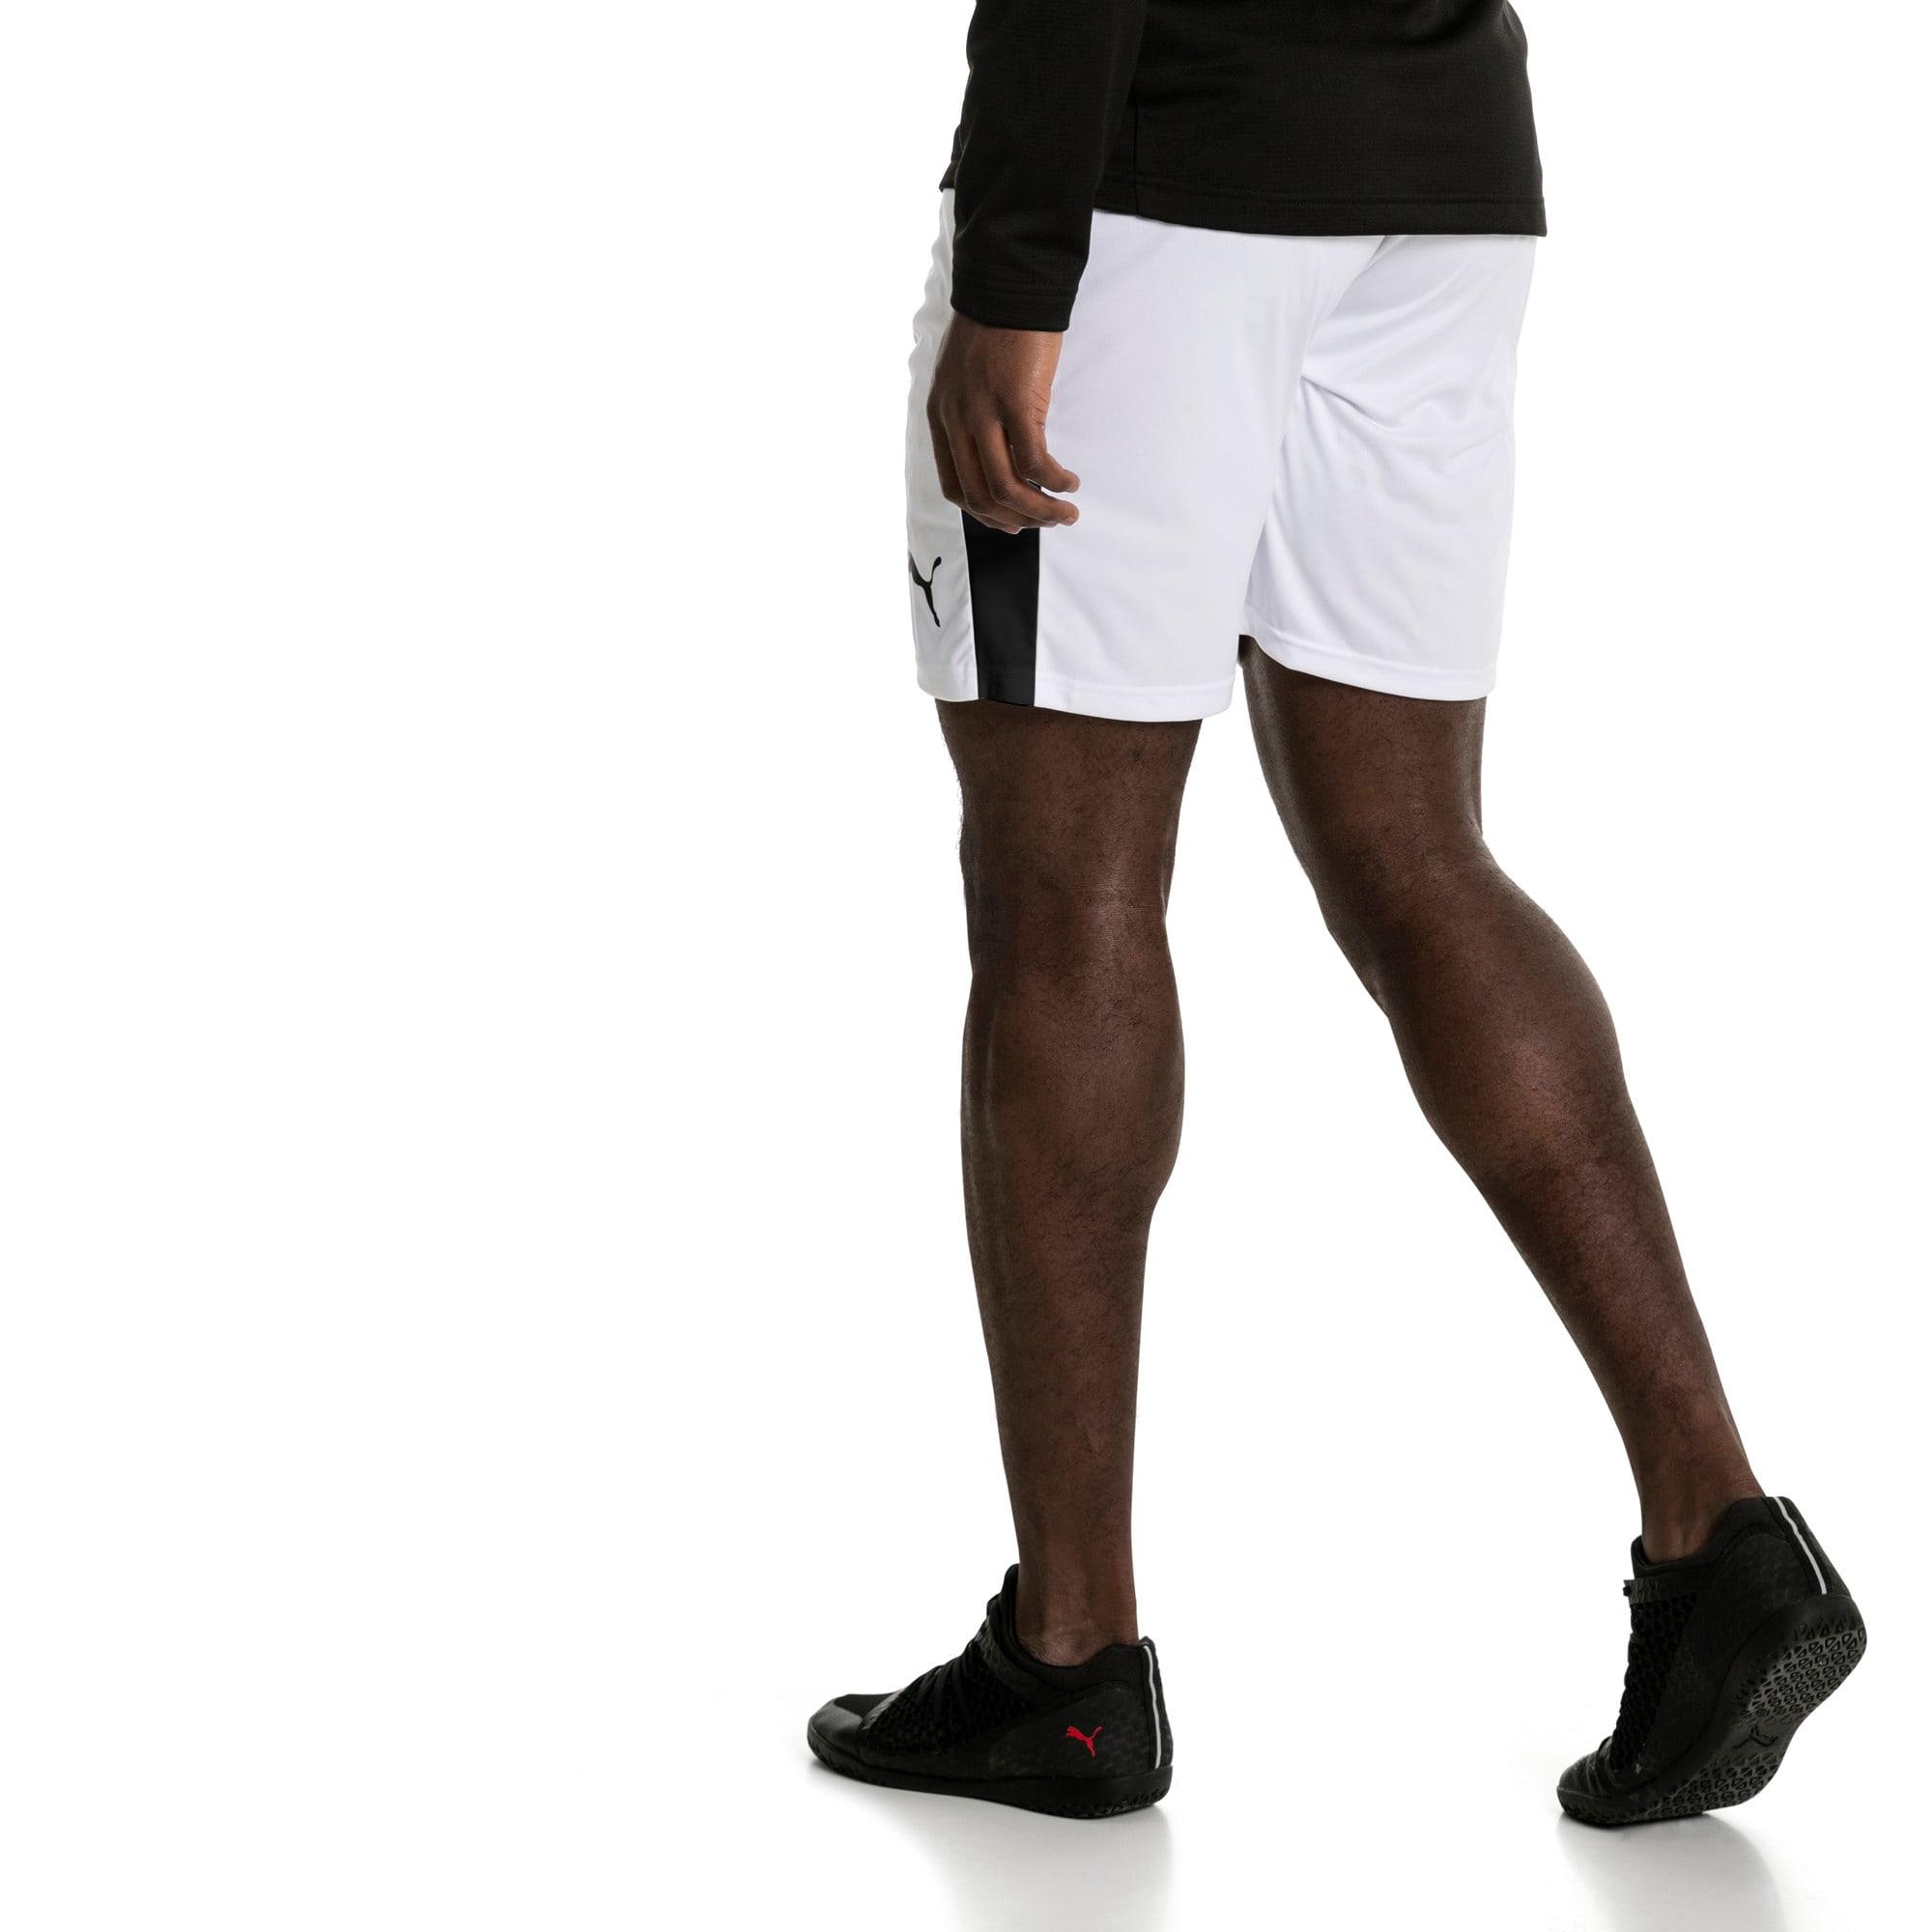 Thumbnail 3 of Liga Men's Shorts, Puma White-Puma Black, medium